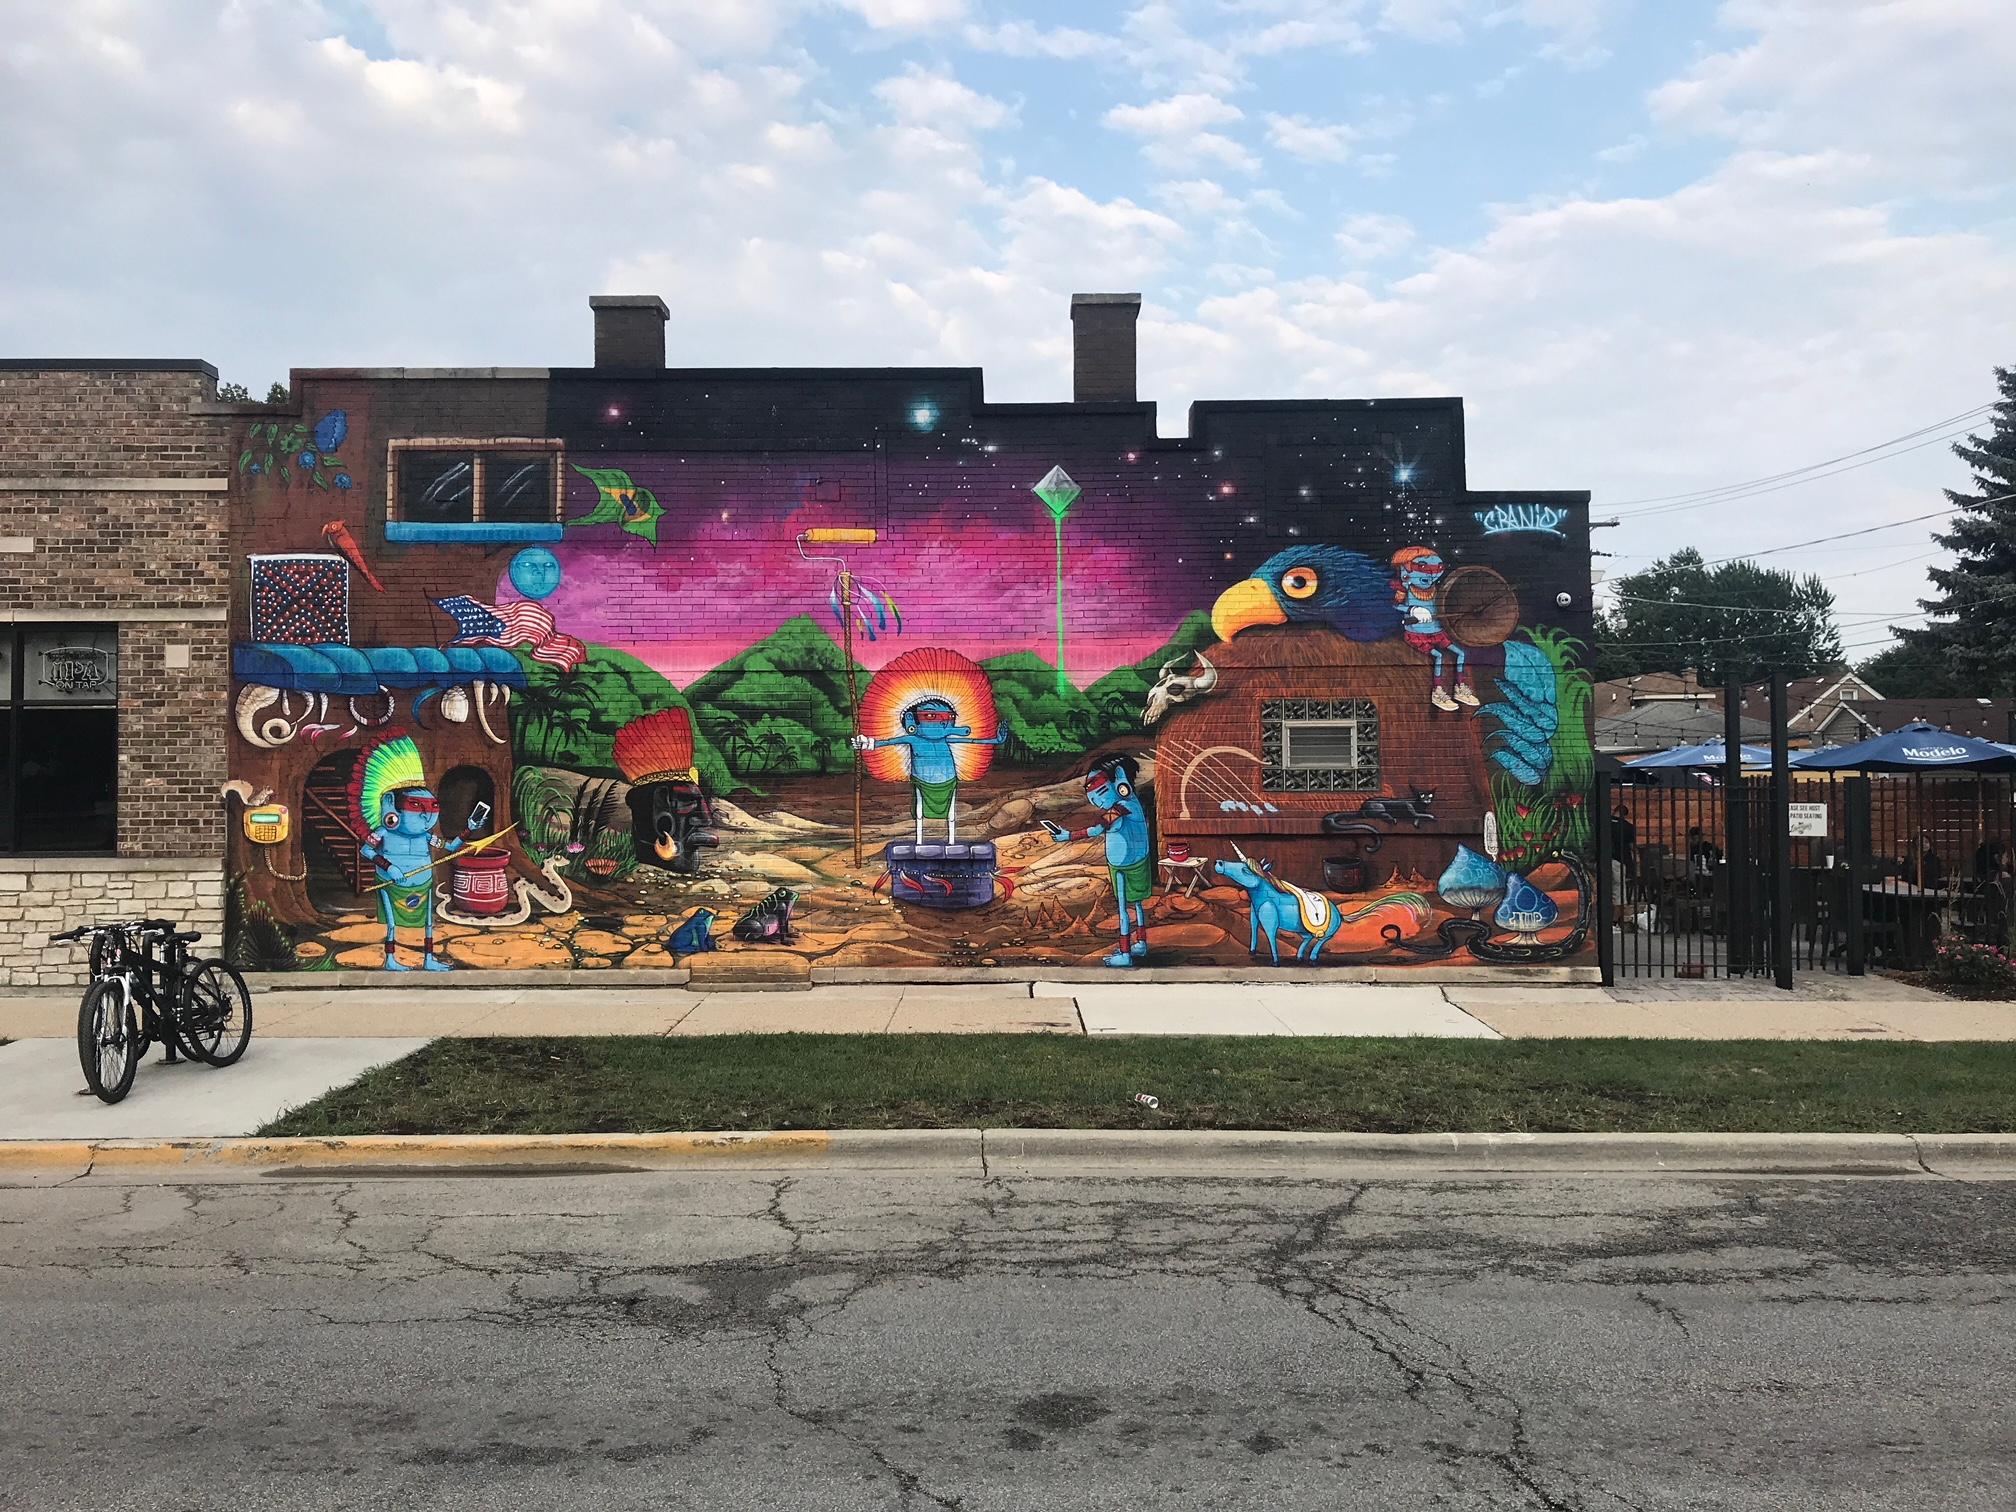 Cranio Creates Jungle Of Colorful New Works In Chicago Artes & contextos IMG 5549